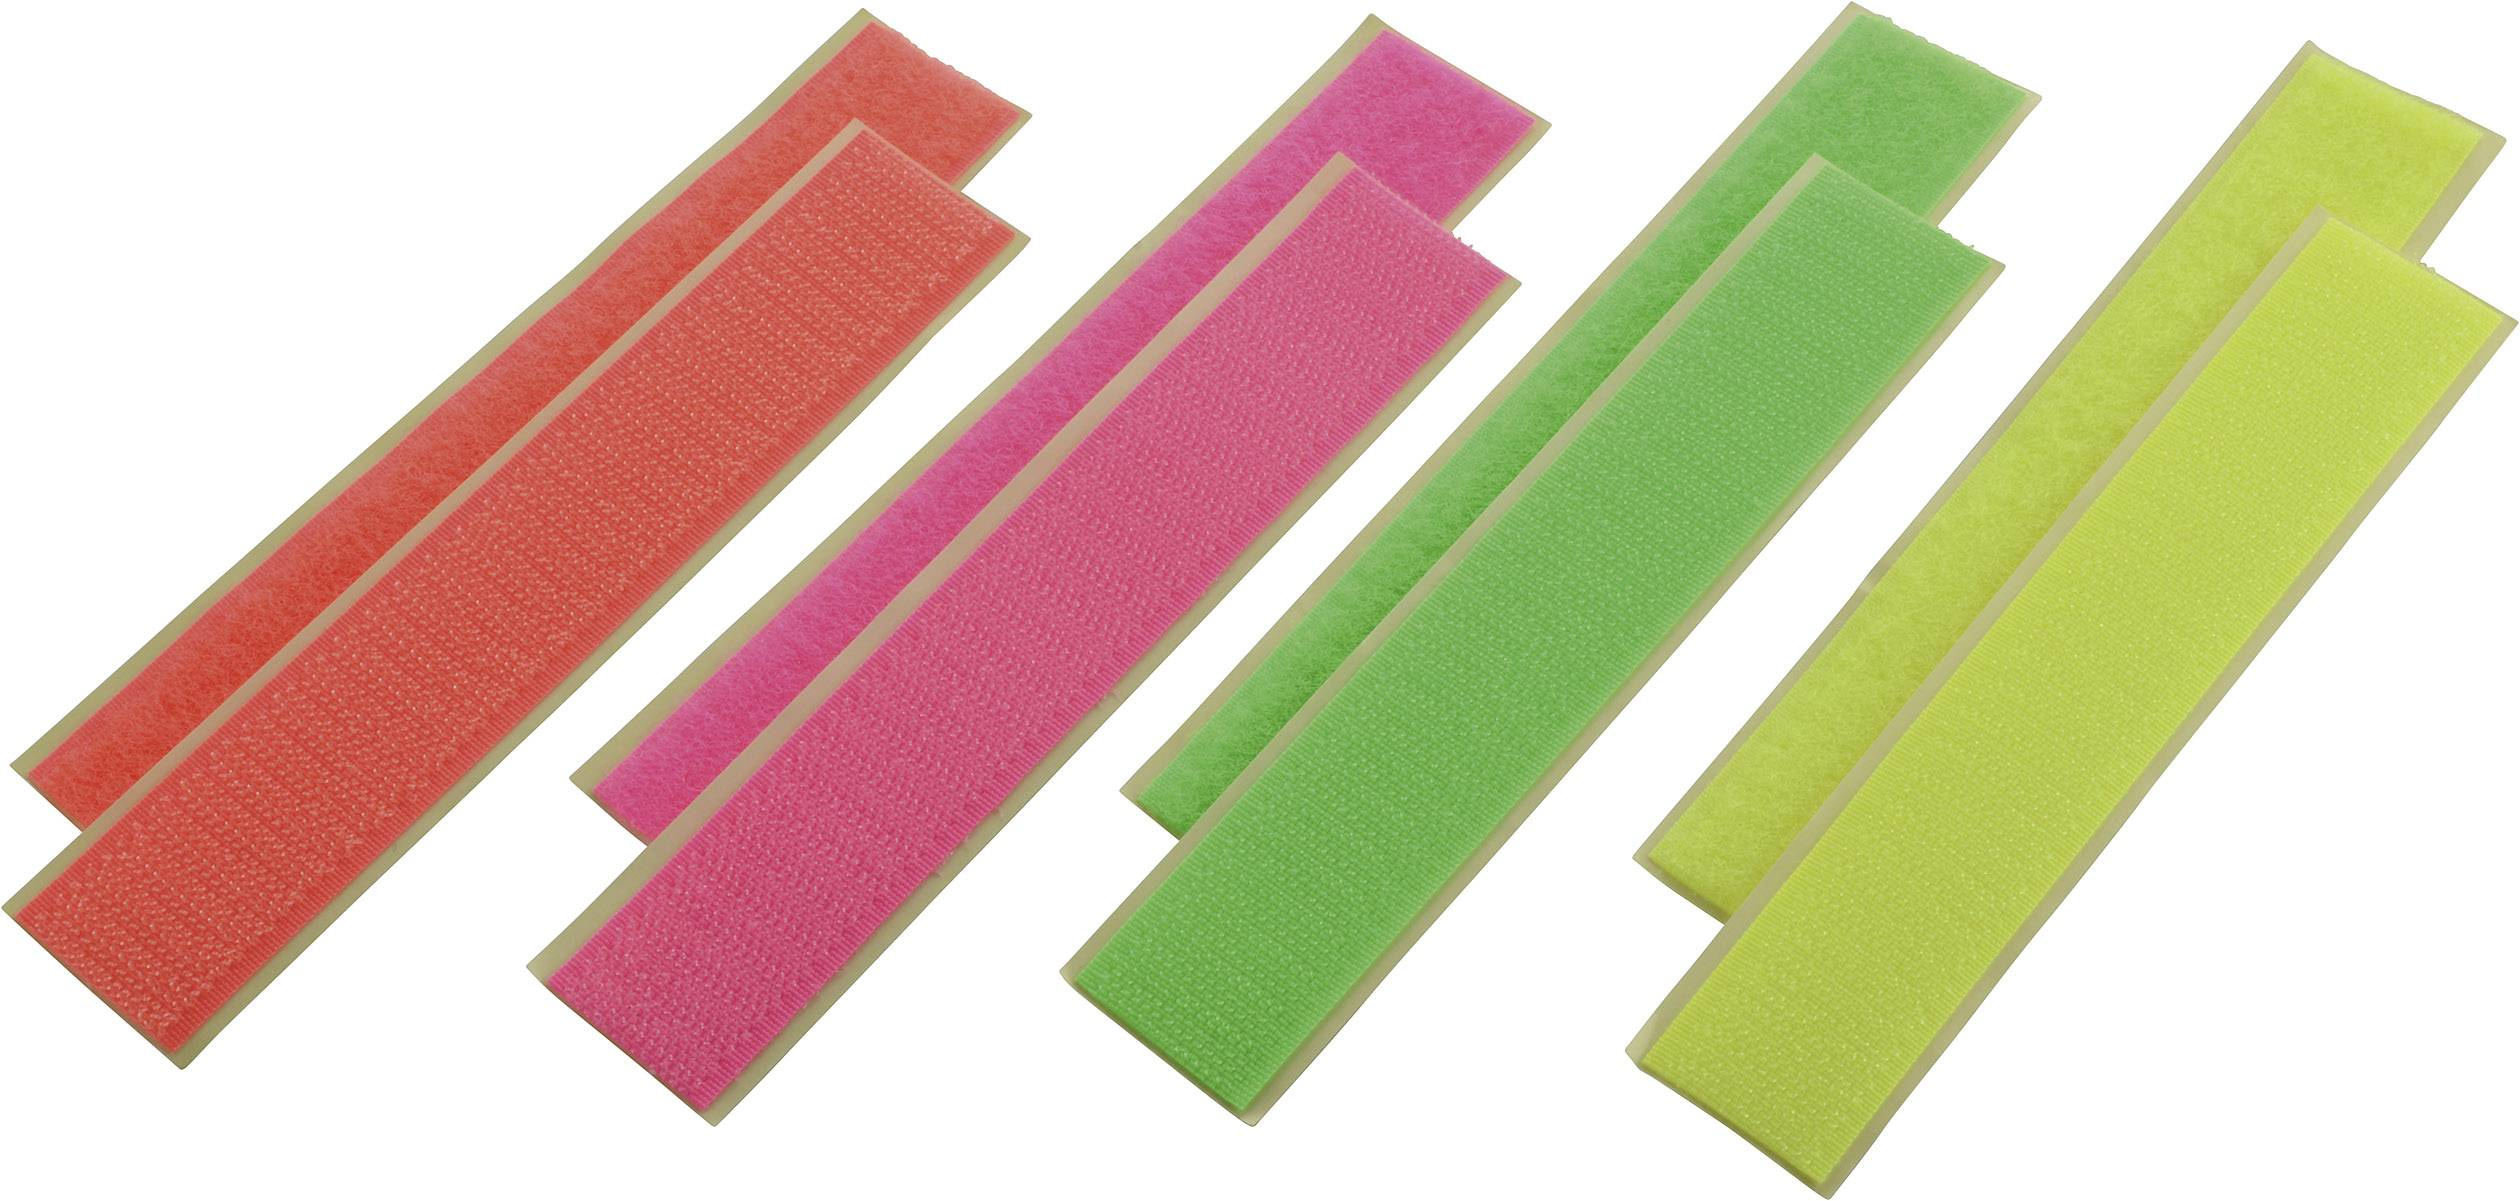 Suchý zip Reely, neonové barvy, 4 ks